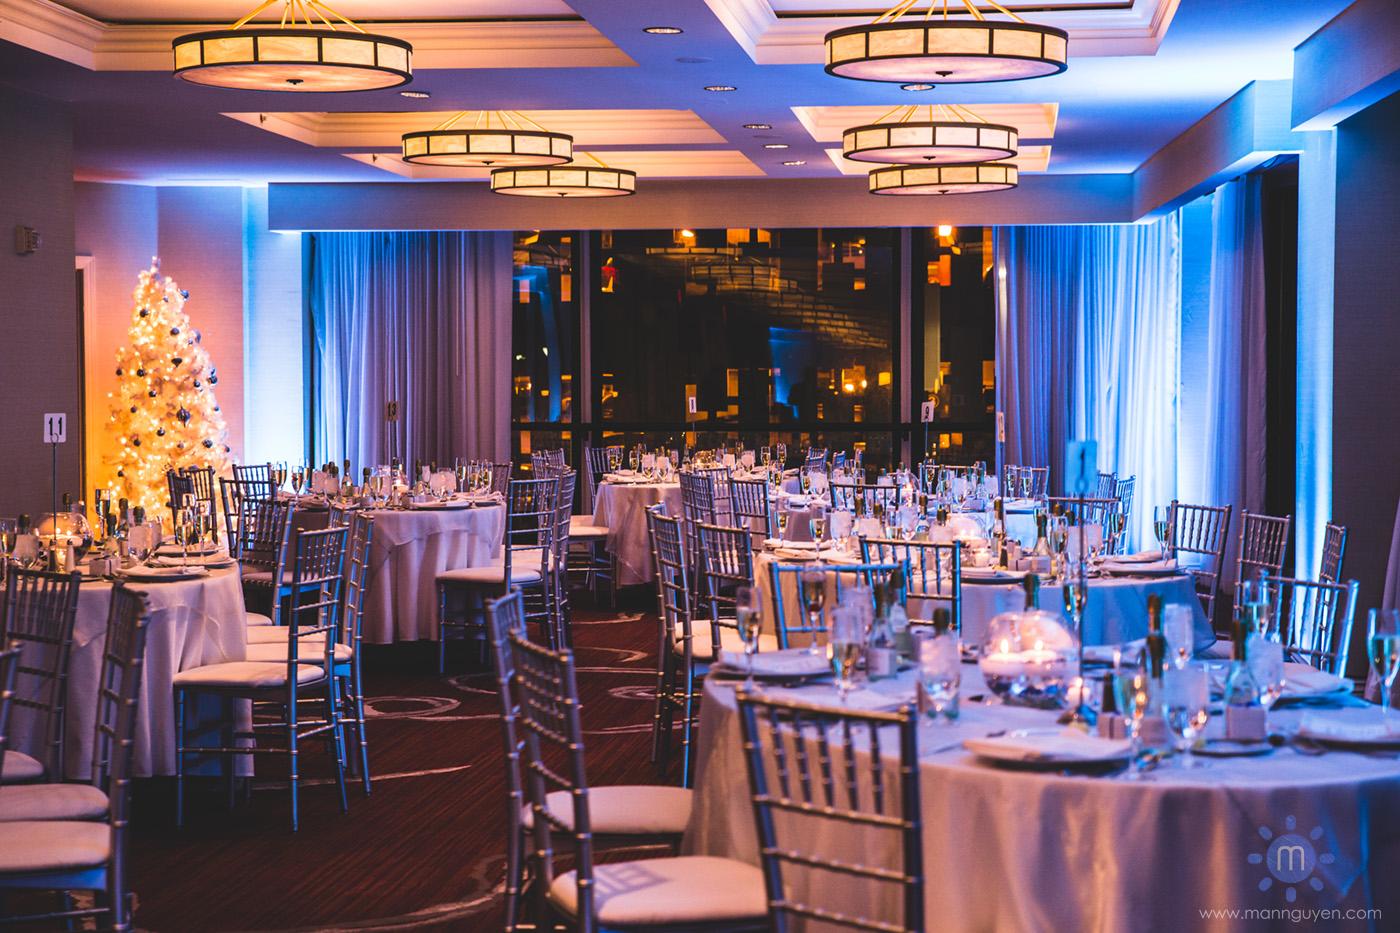 Renaissance Hotel Venue Downtown Pittsburgh Wedding Photographer